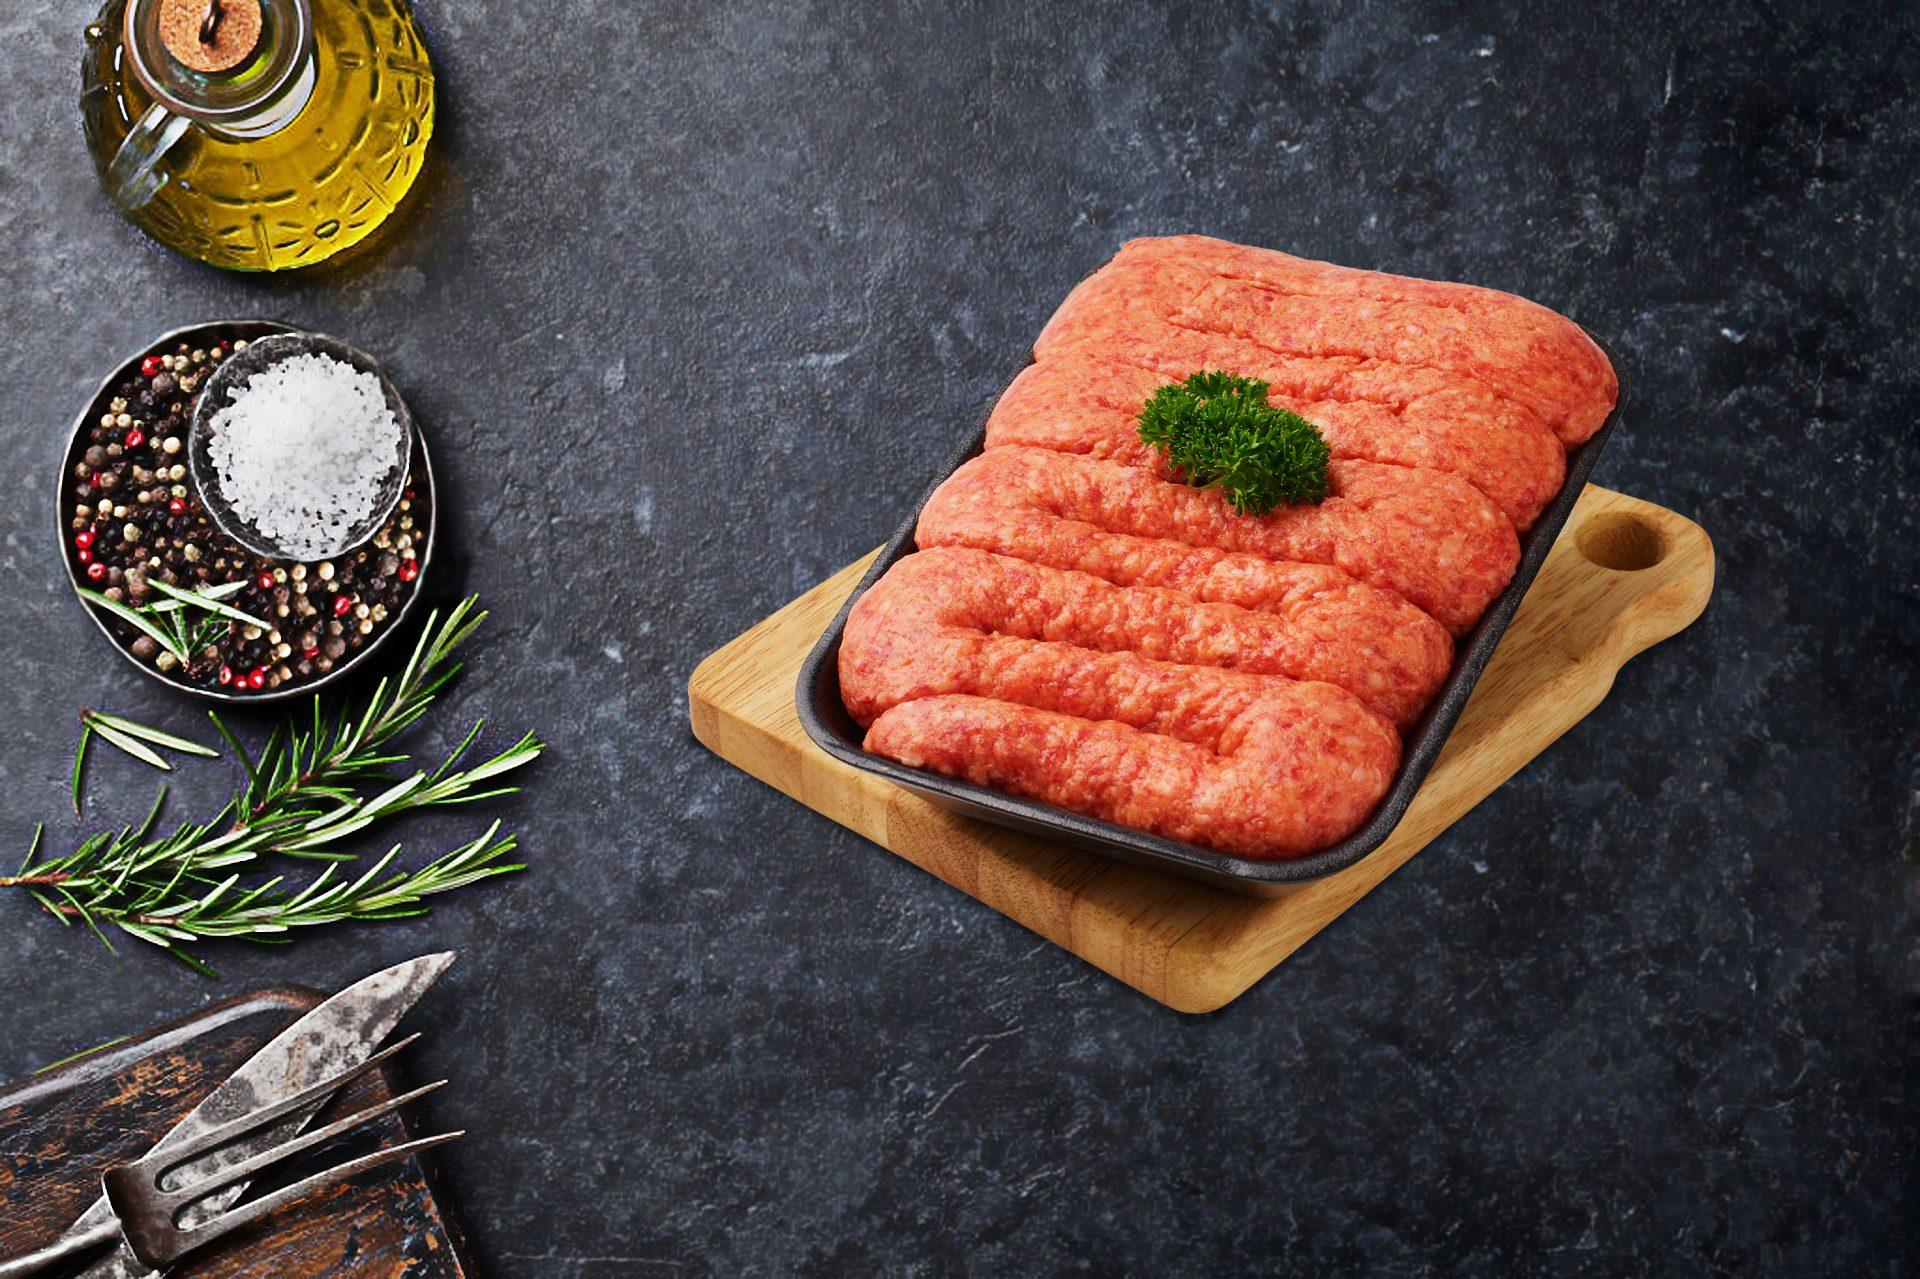 BBQ Sausage Meat